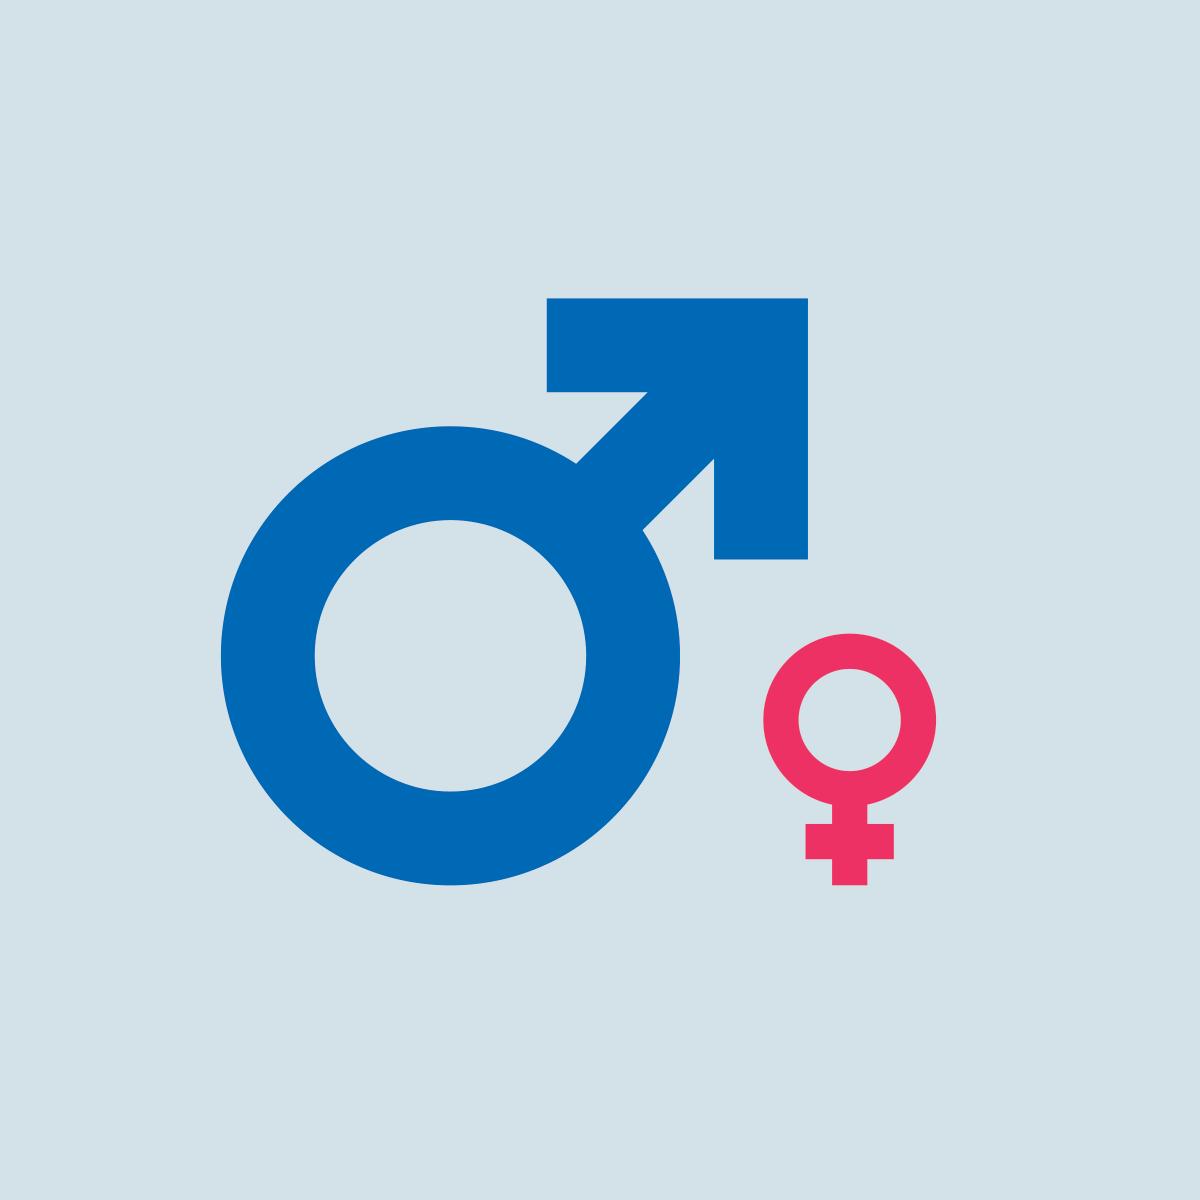 72 gender inequality